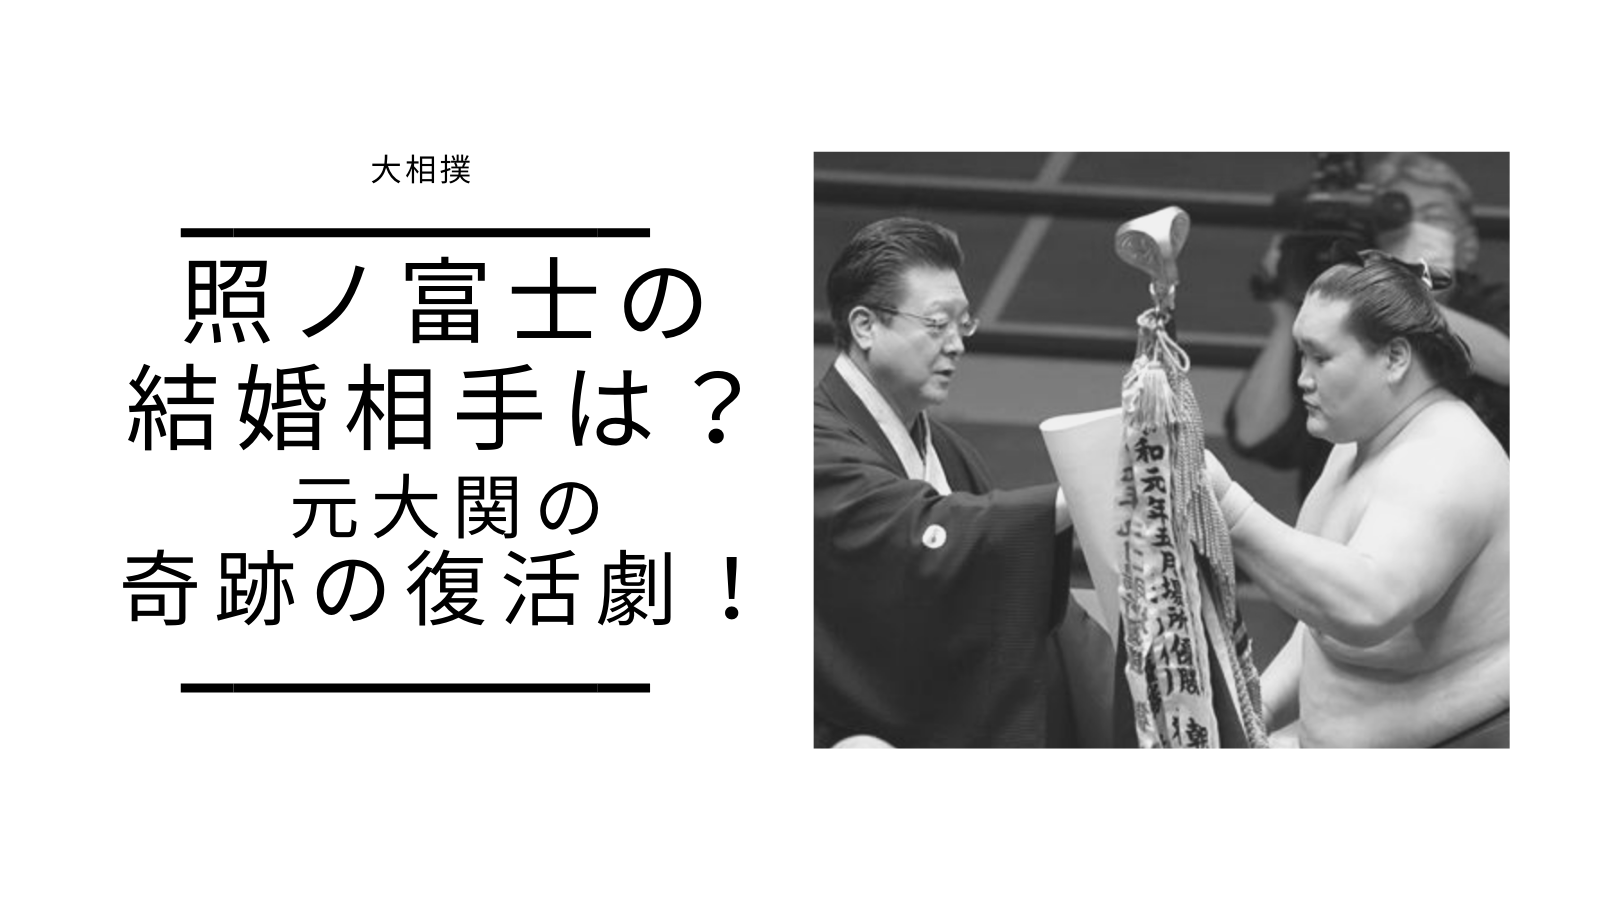 富士 照 結婚 ノ